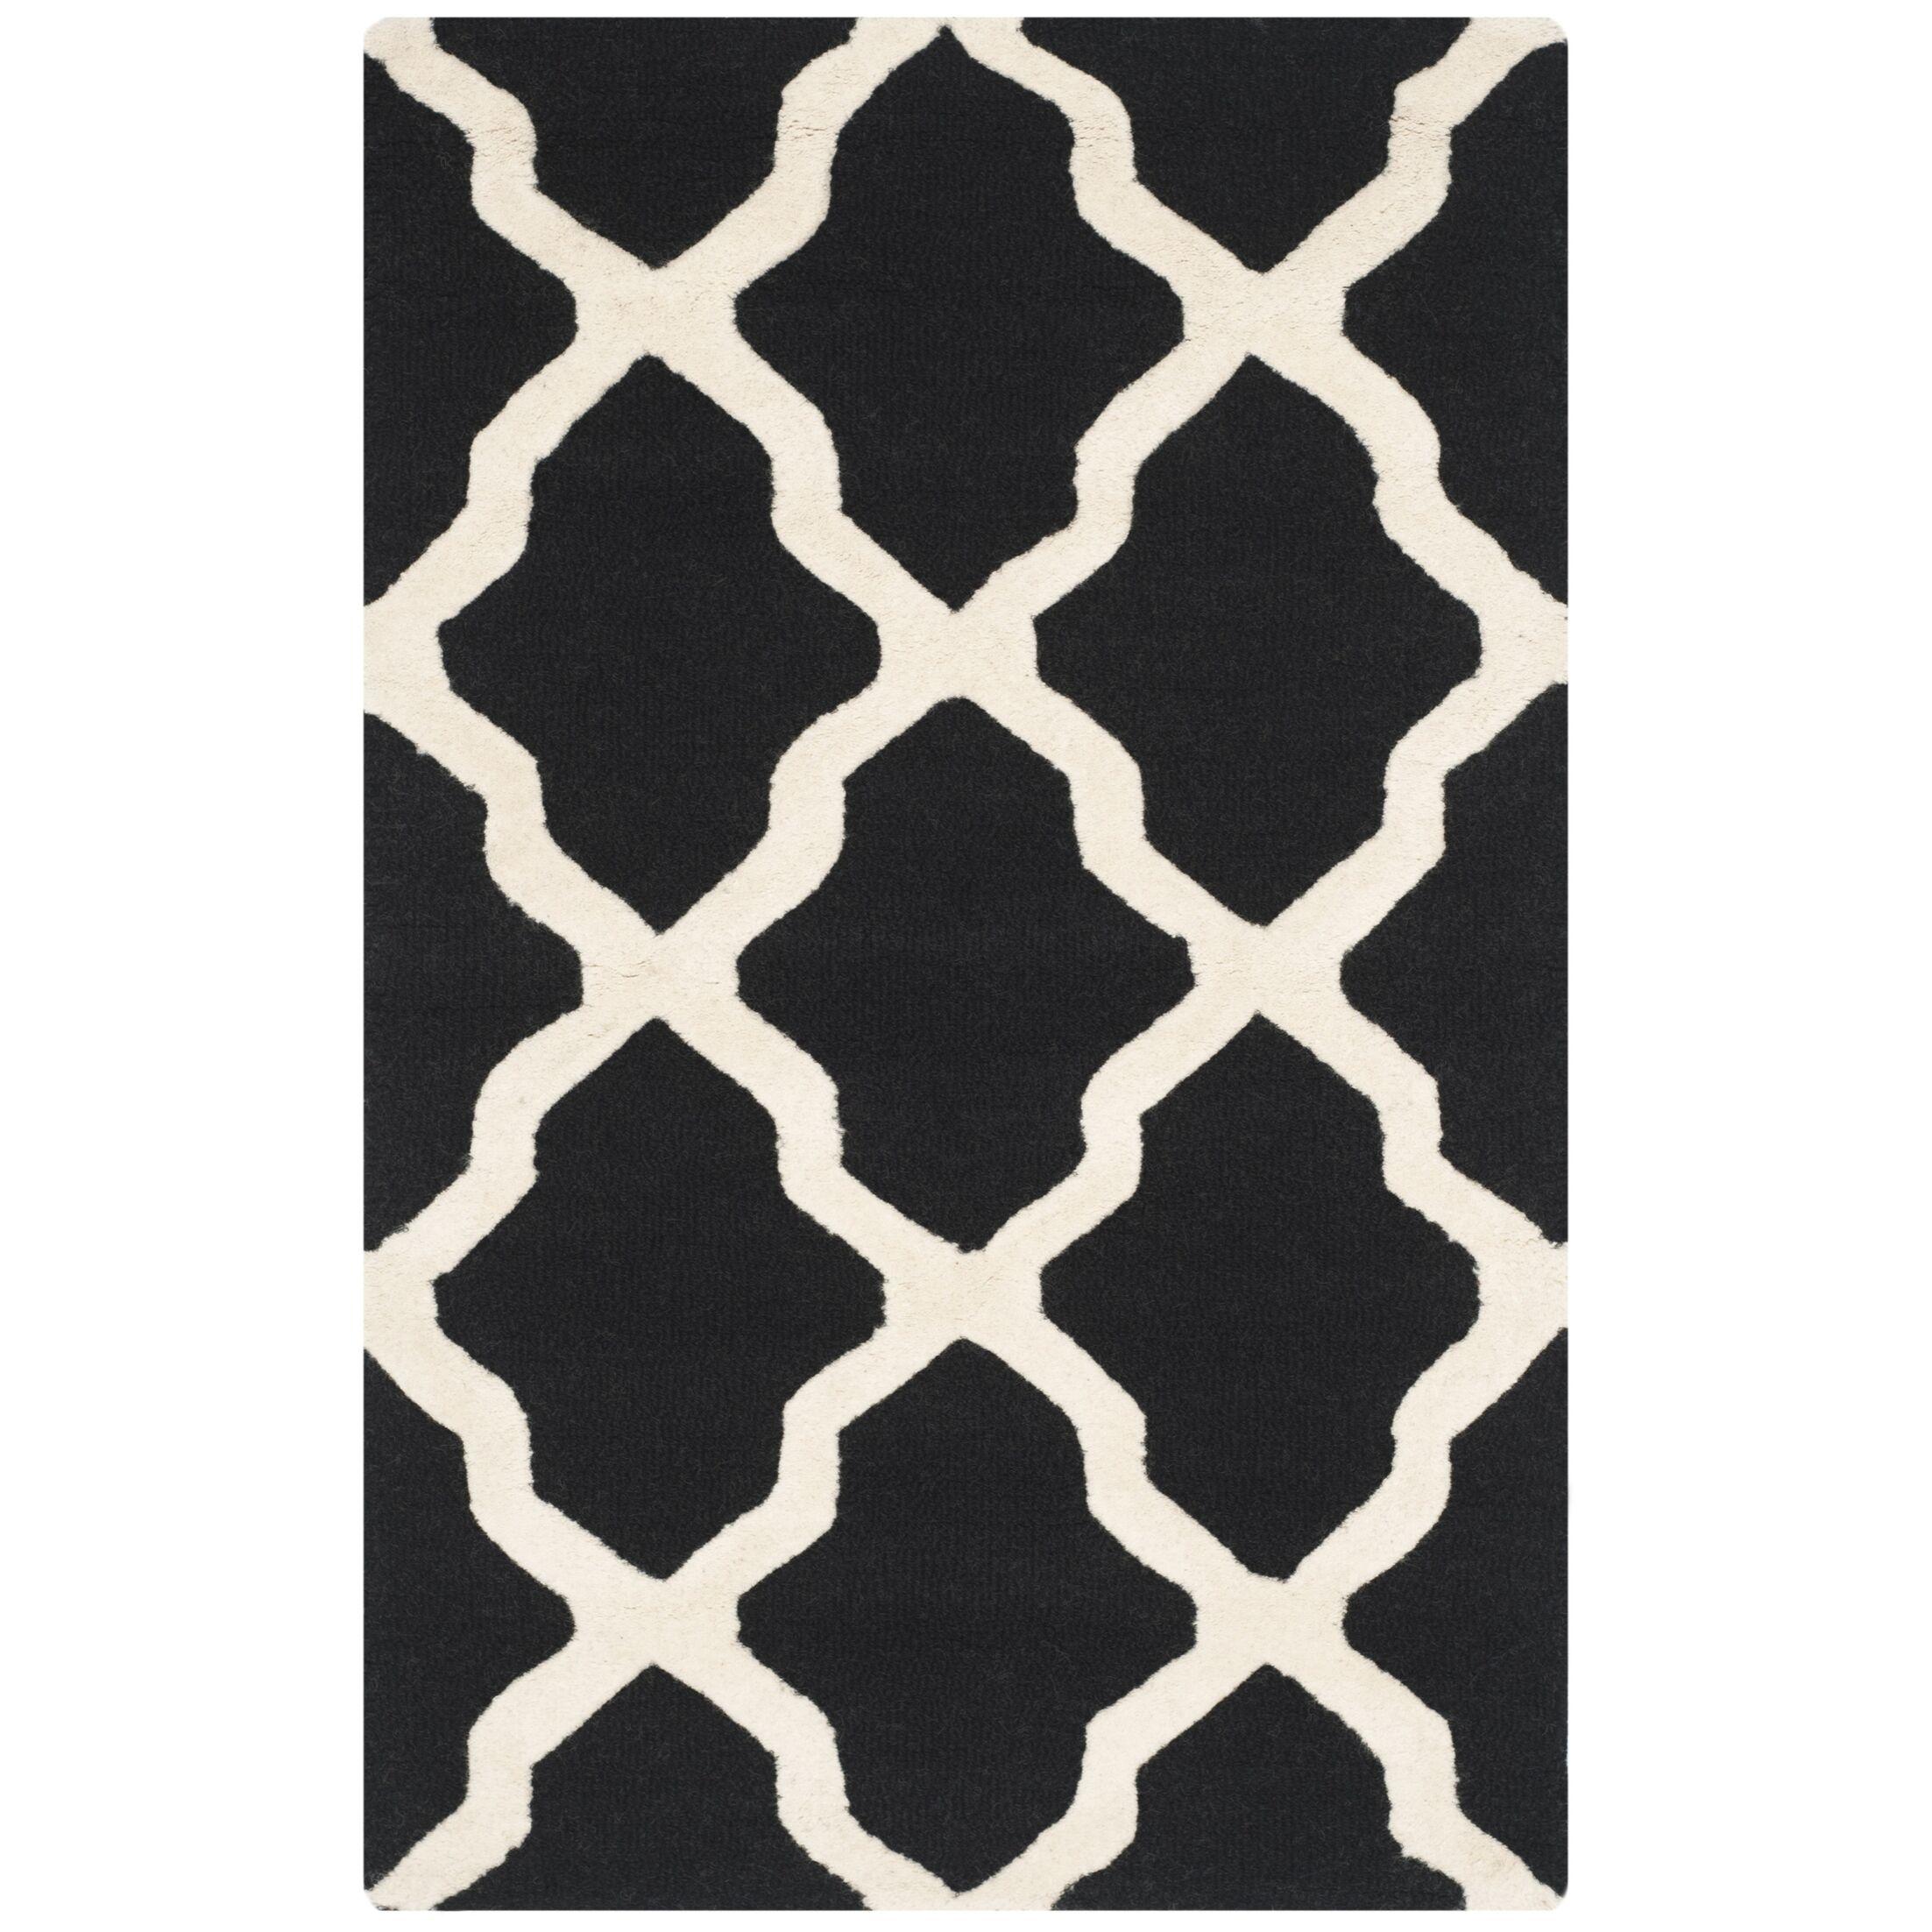 Charlenne Black & Ivory Area Rug Rug Size: Rectangle 10' x 14'